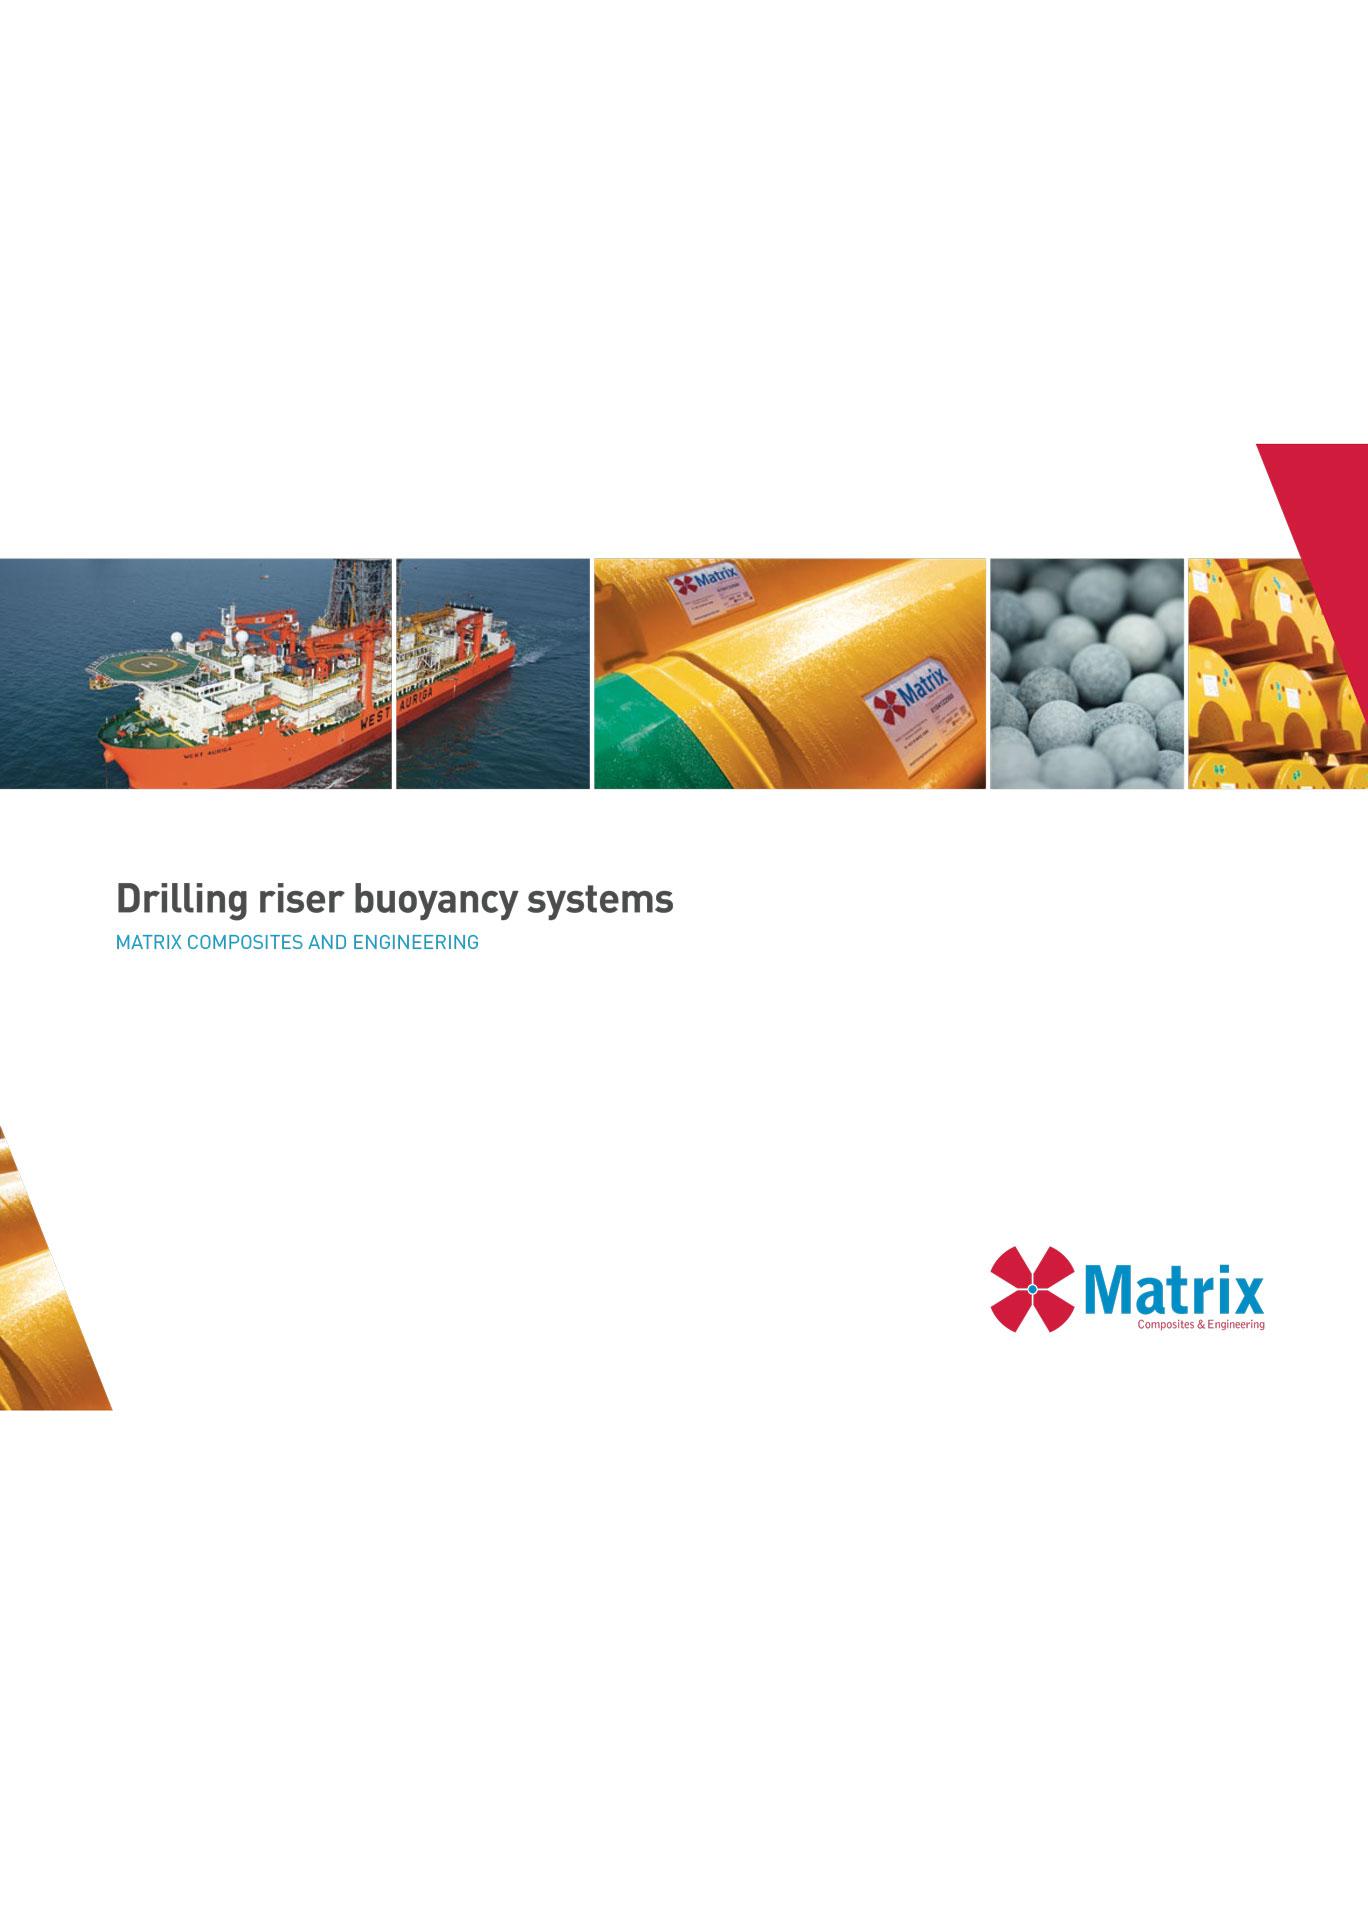 Drilling Riser Buoyancy Systems